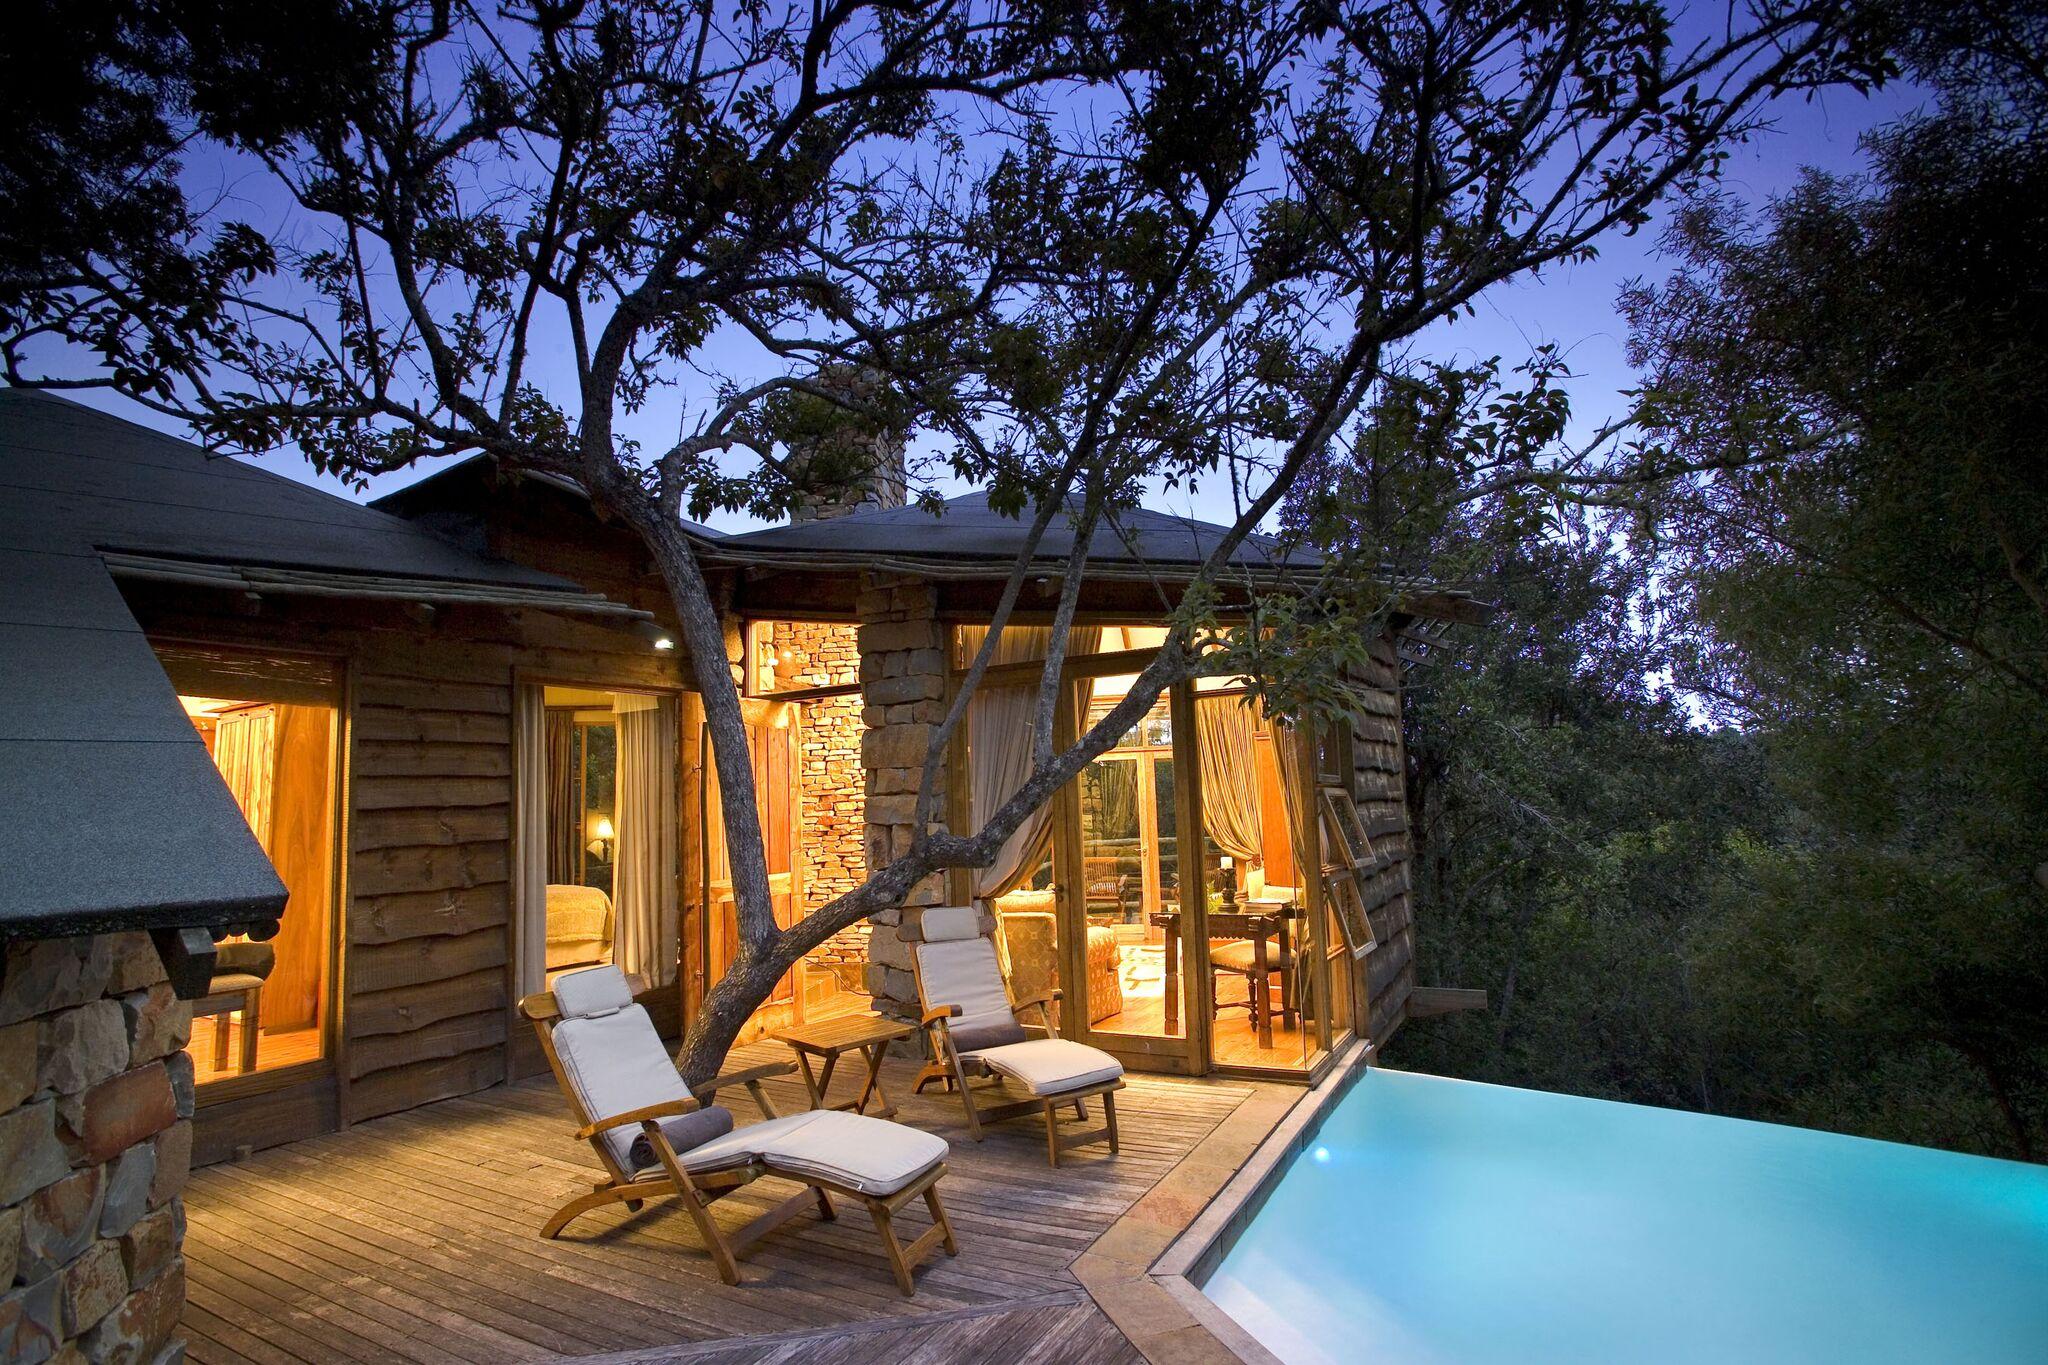 tsala-treehouse-luxury-southafrica-lustforthesublime